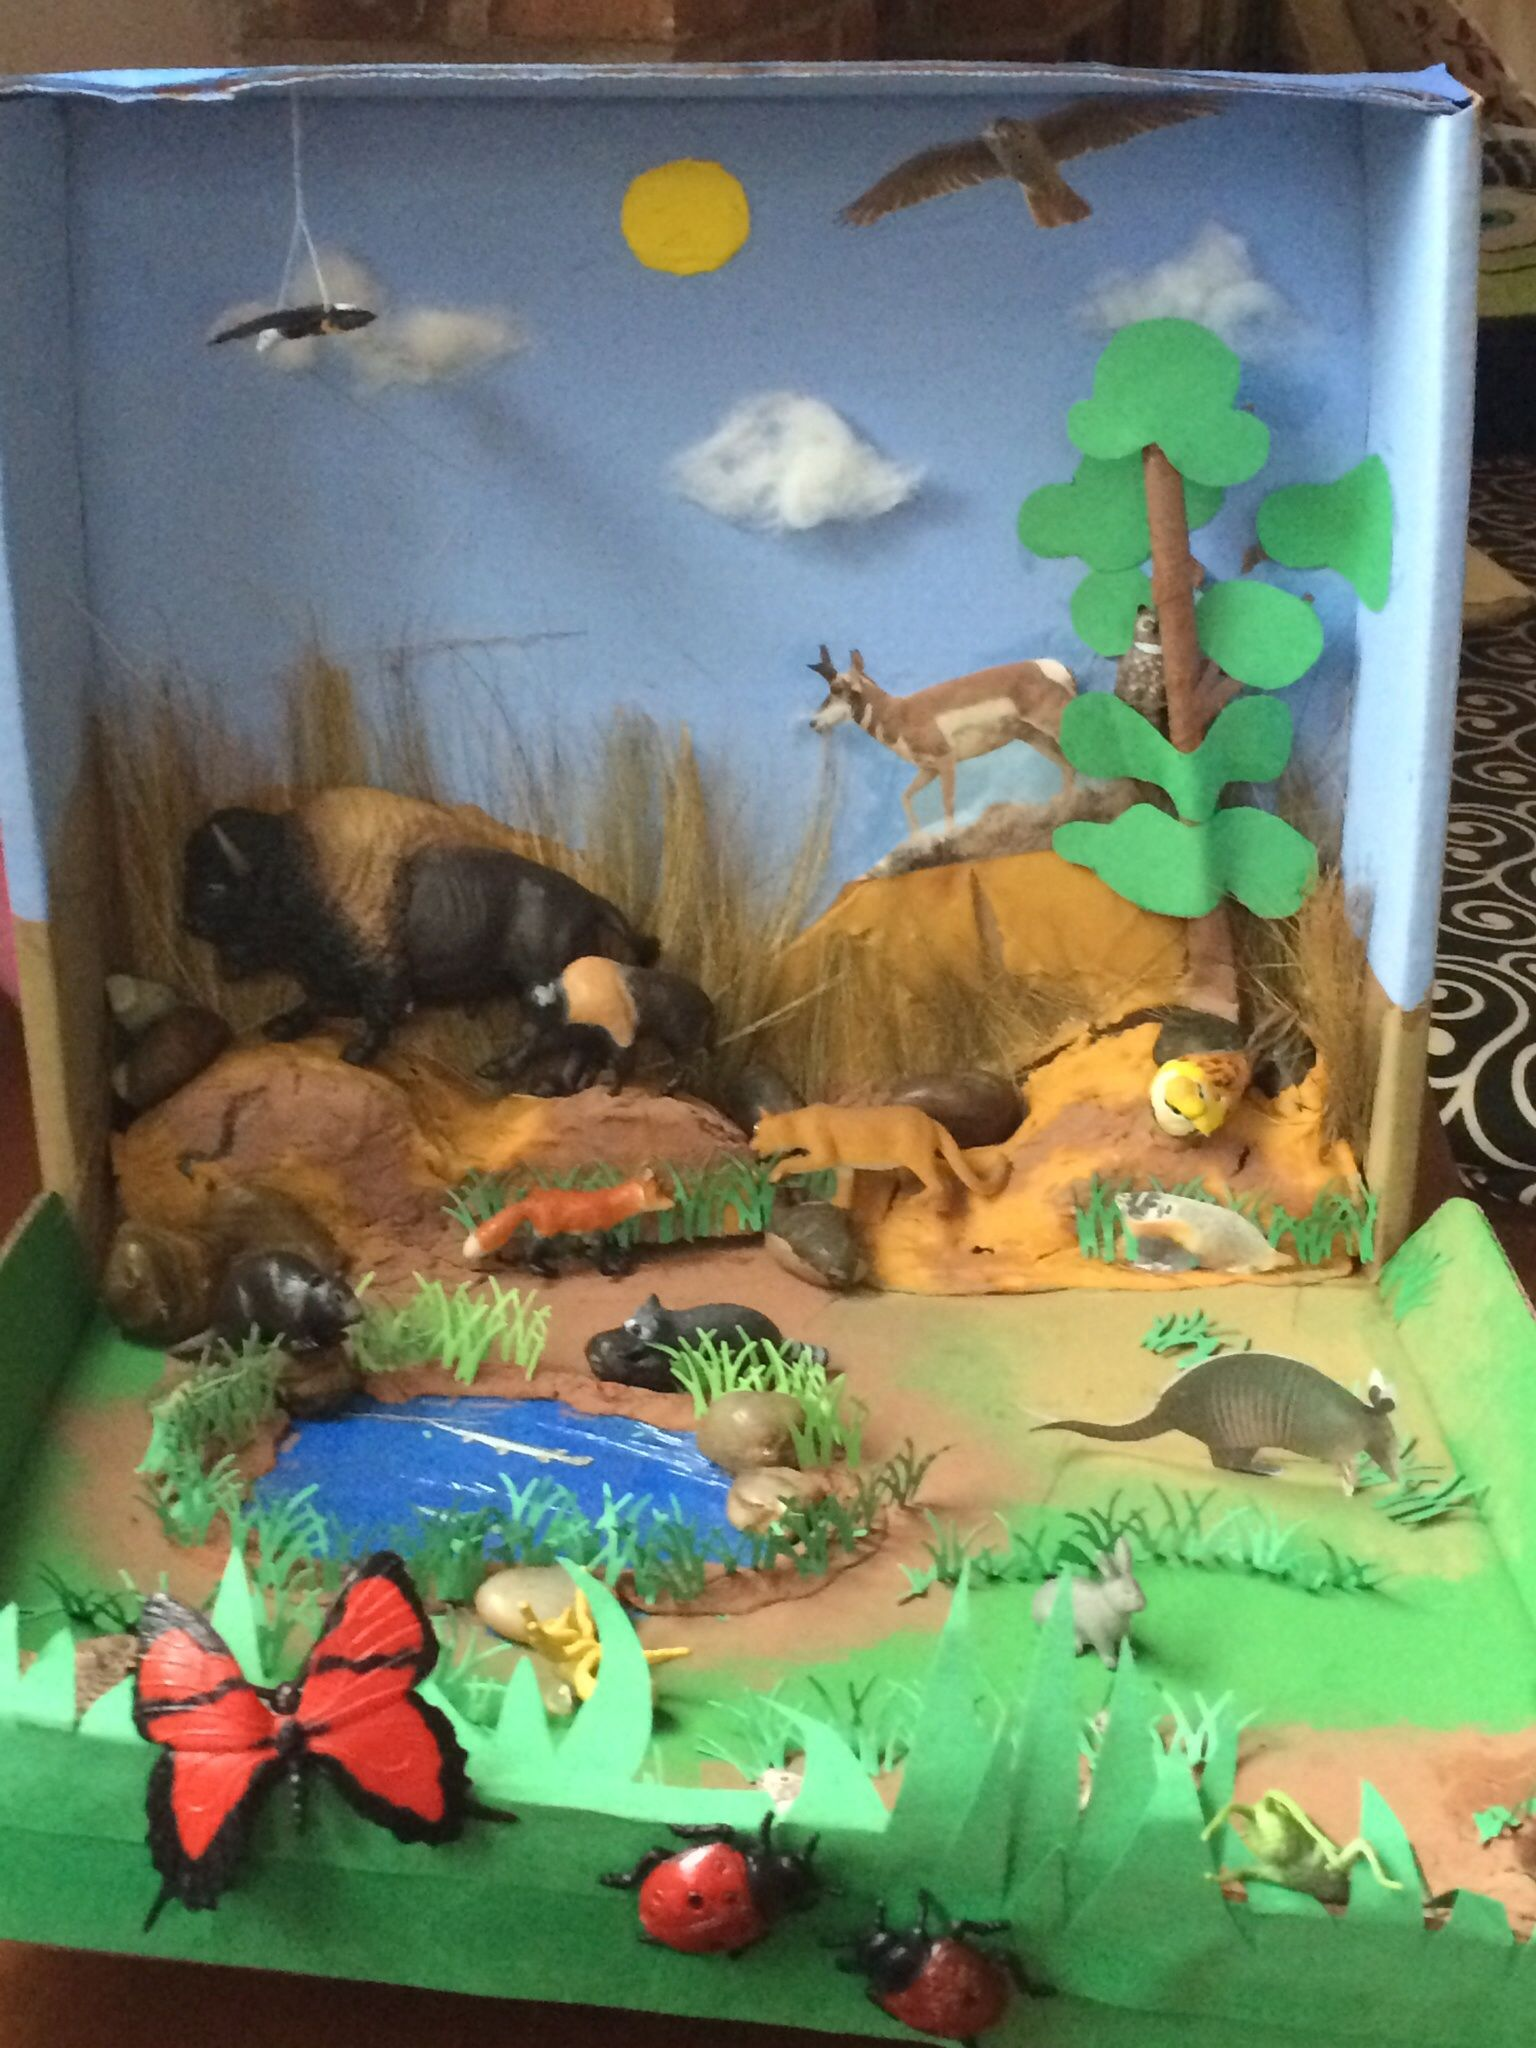 African Elephant Food Chain Diagram Nordyne E1eh Wiring Biome Diorama Grasslands School Biomes